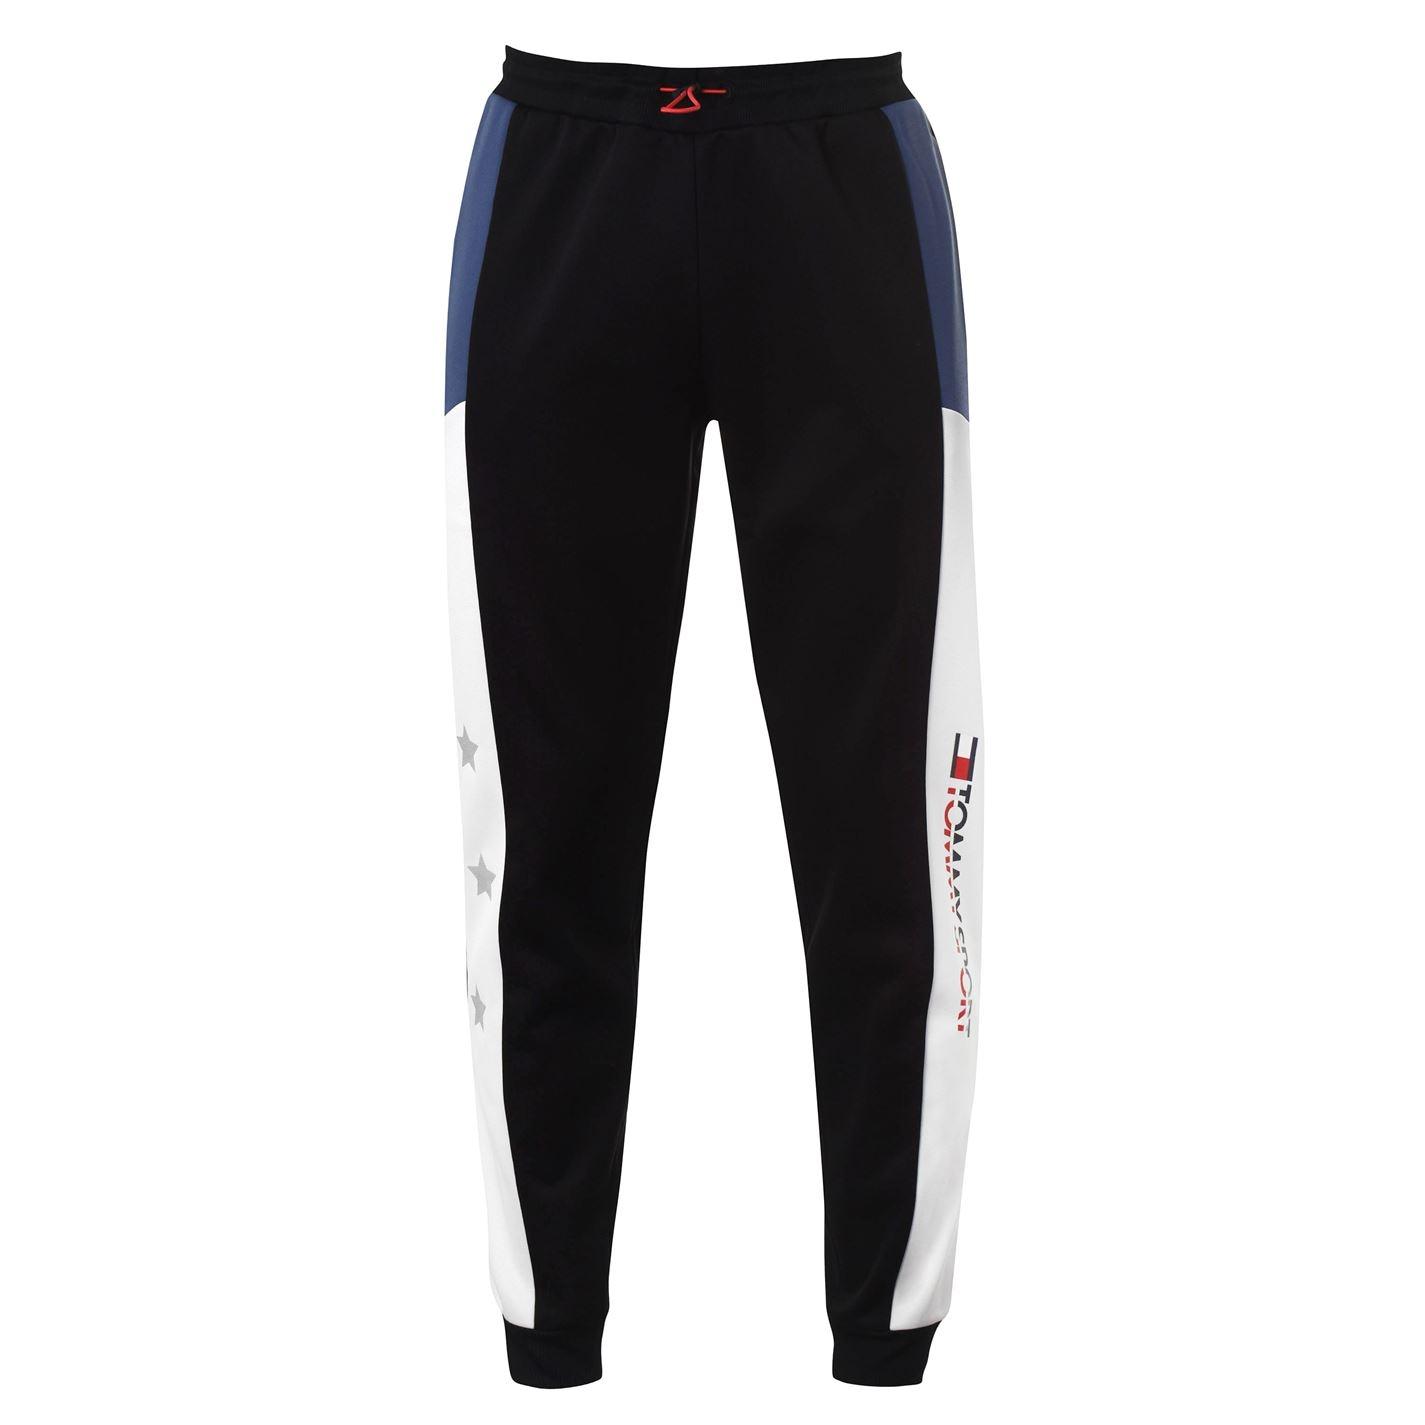 Mergi la Pantaloni jogging Tommy Sport Reflect pvh negru